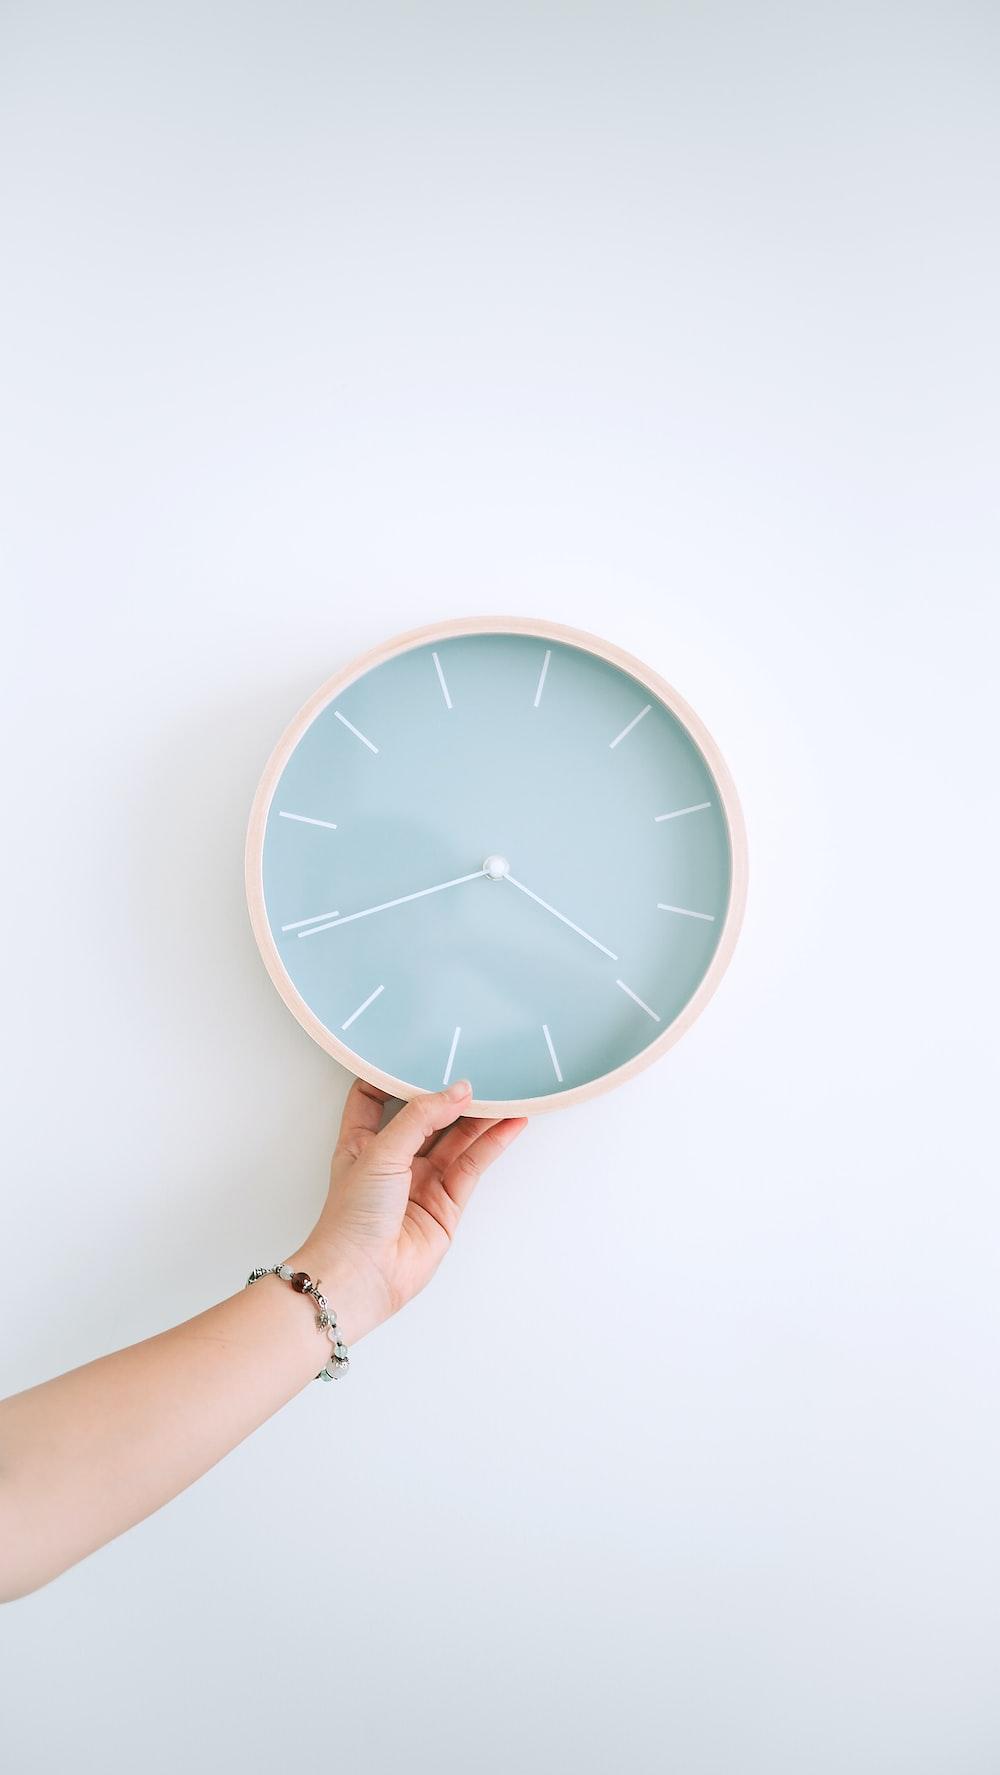 round grey wall clock